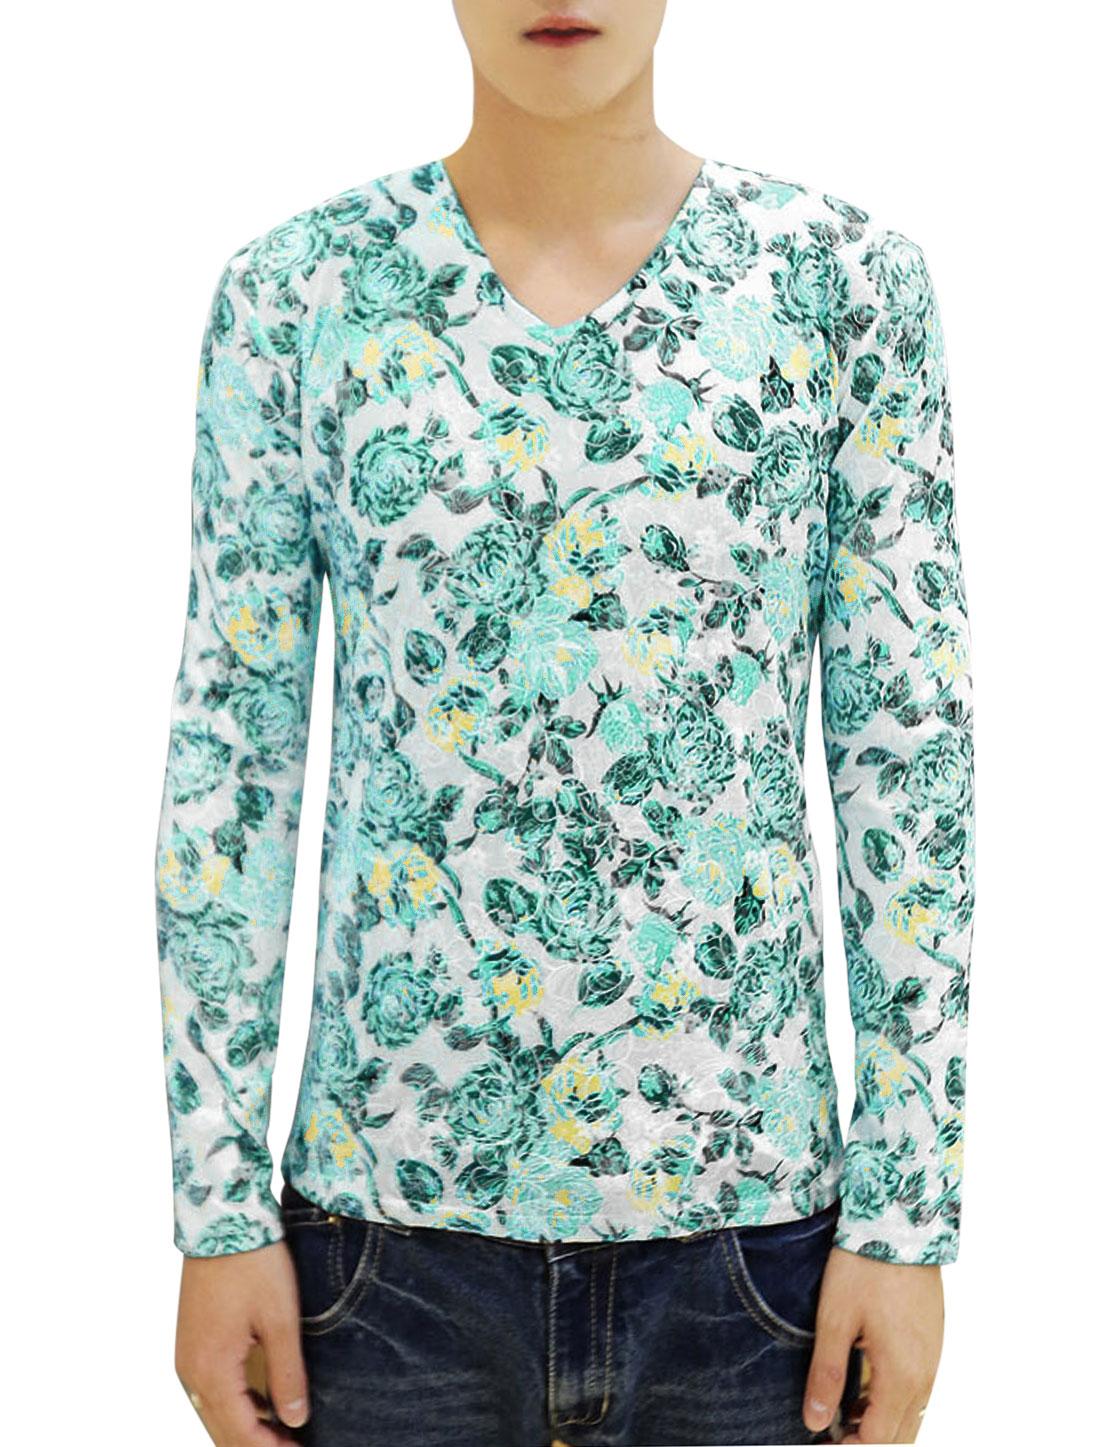 Men Pullover V Neck Floral Pattern Leisure T-shirt Green White S